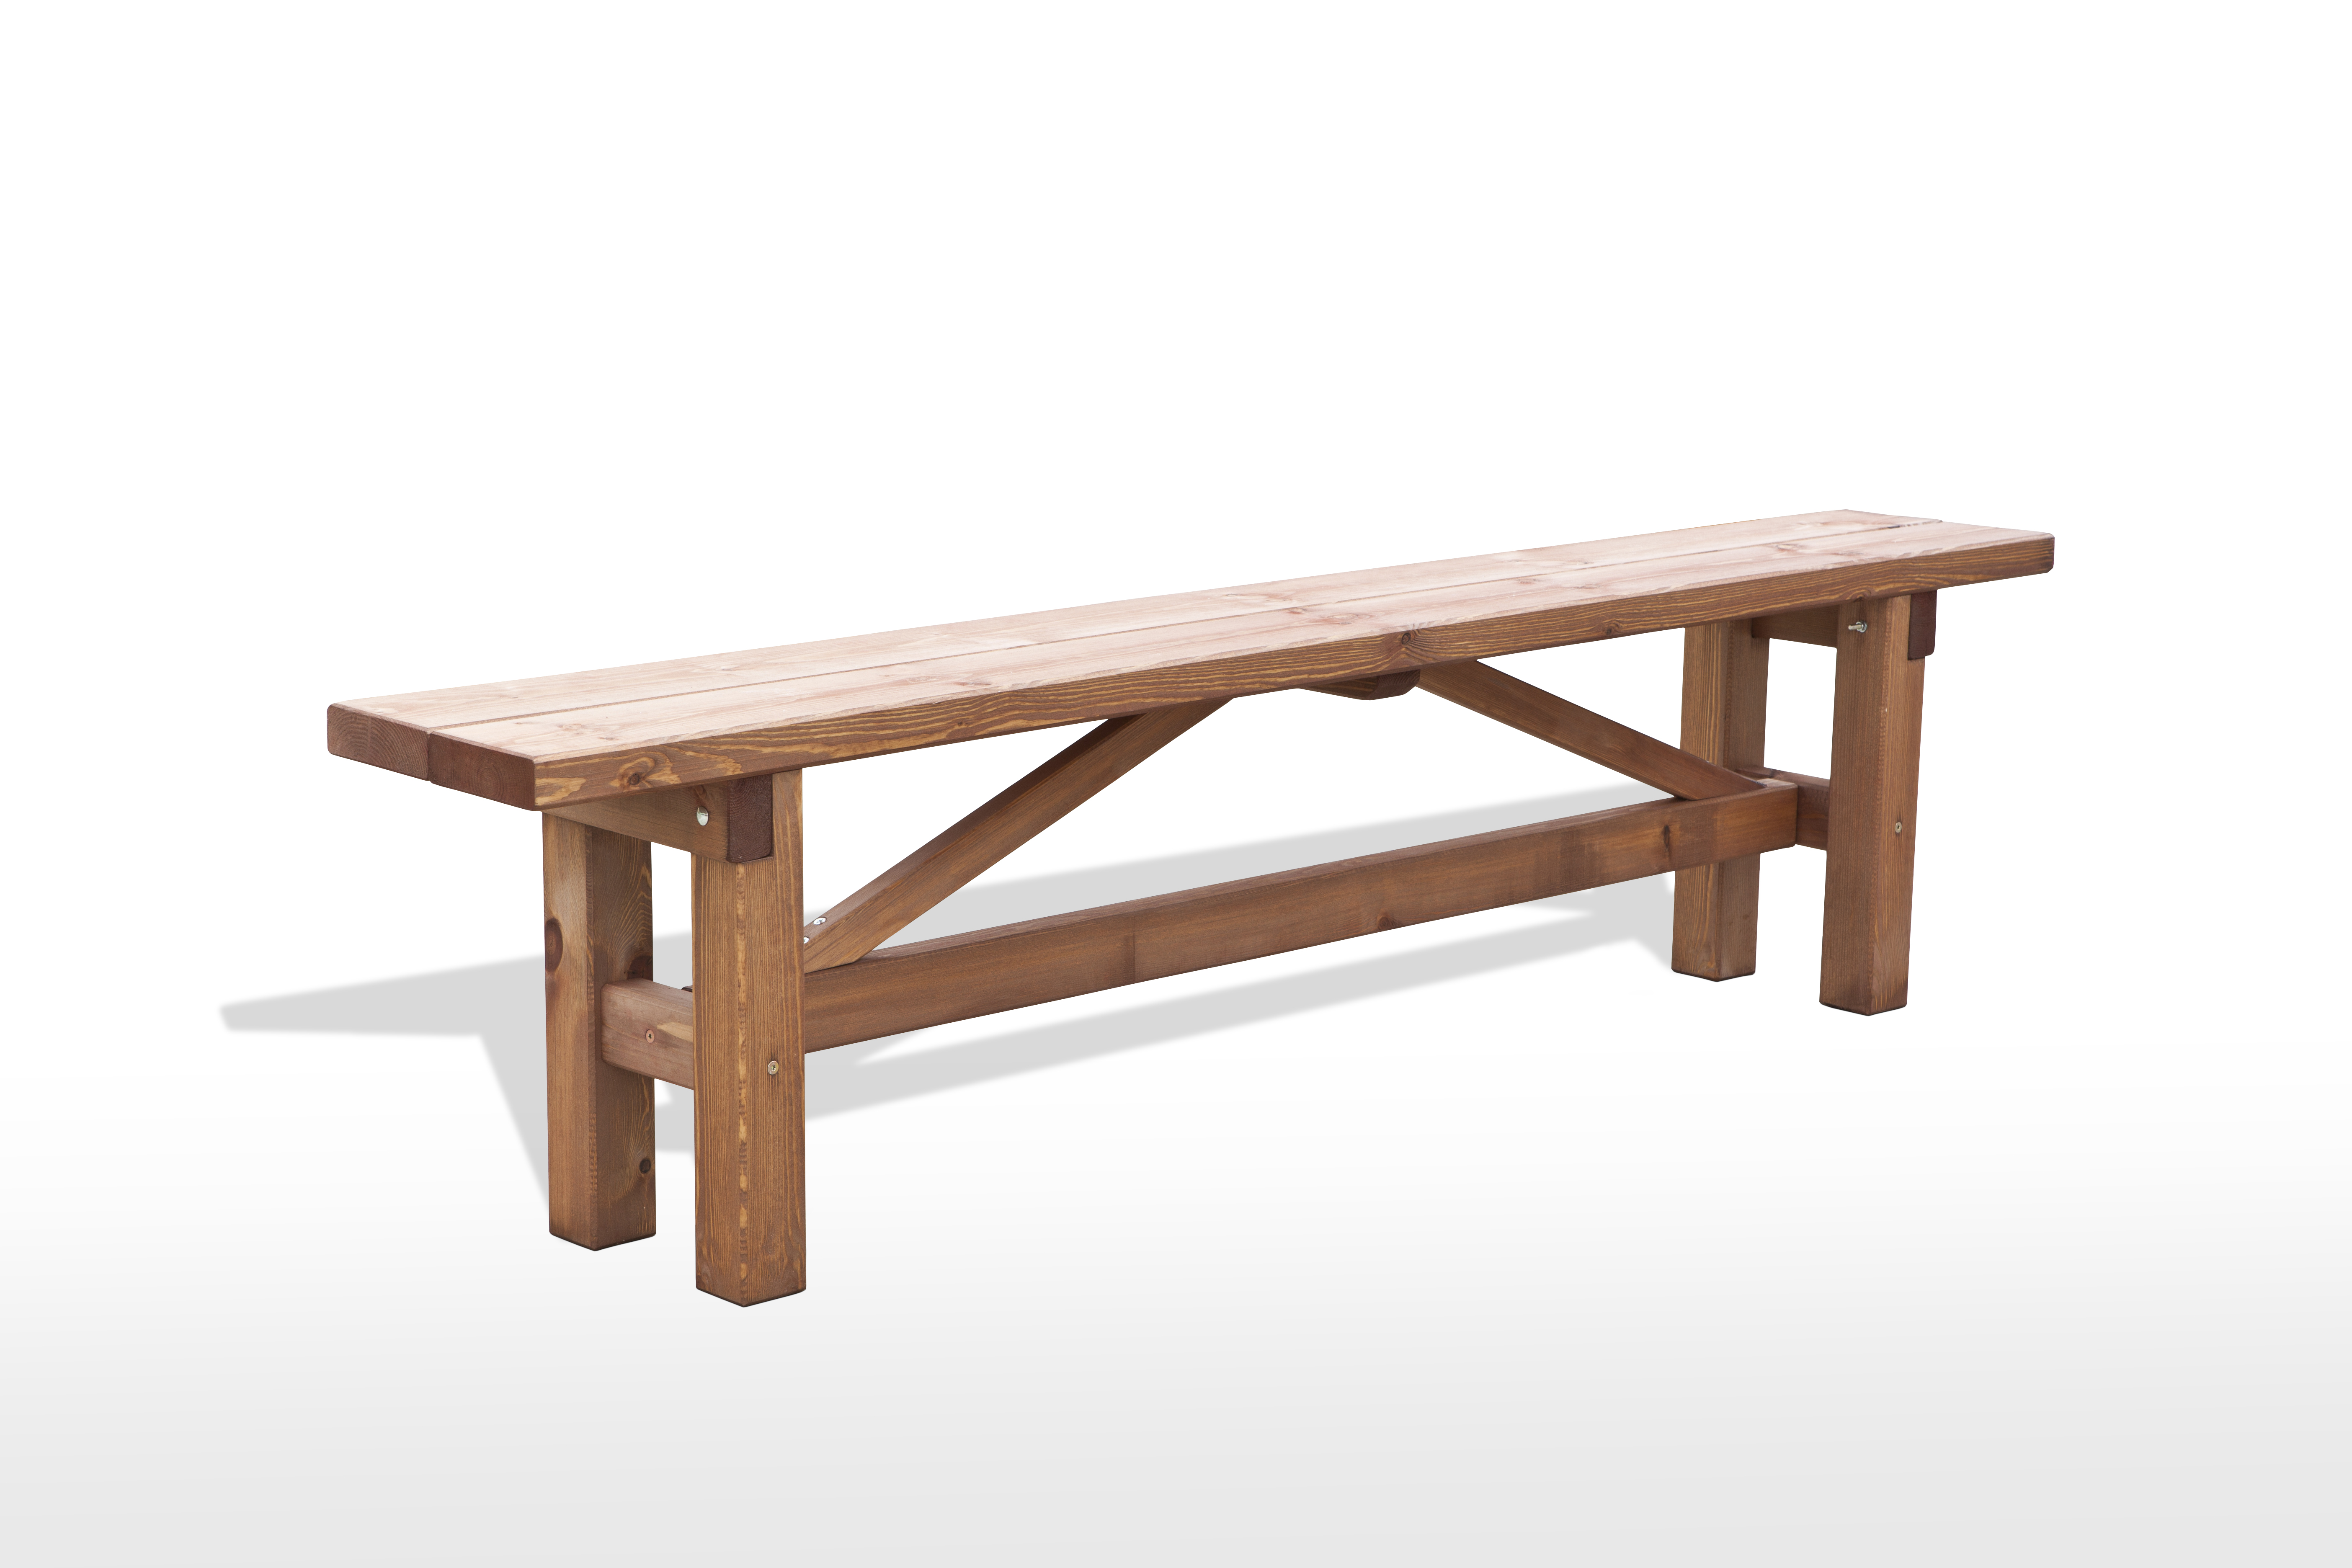 Banco de madera para jard n muebles de casa jard n terraza for Banco madera jardin